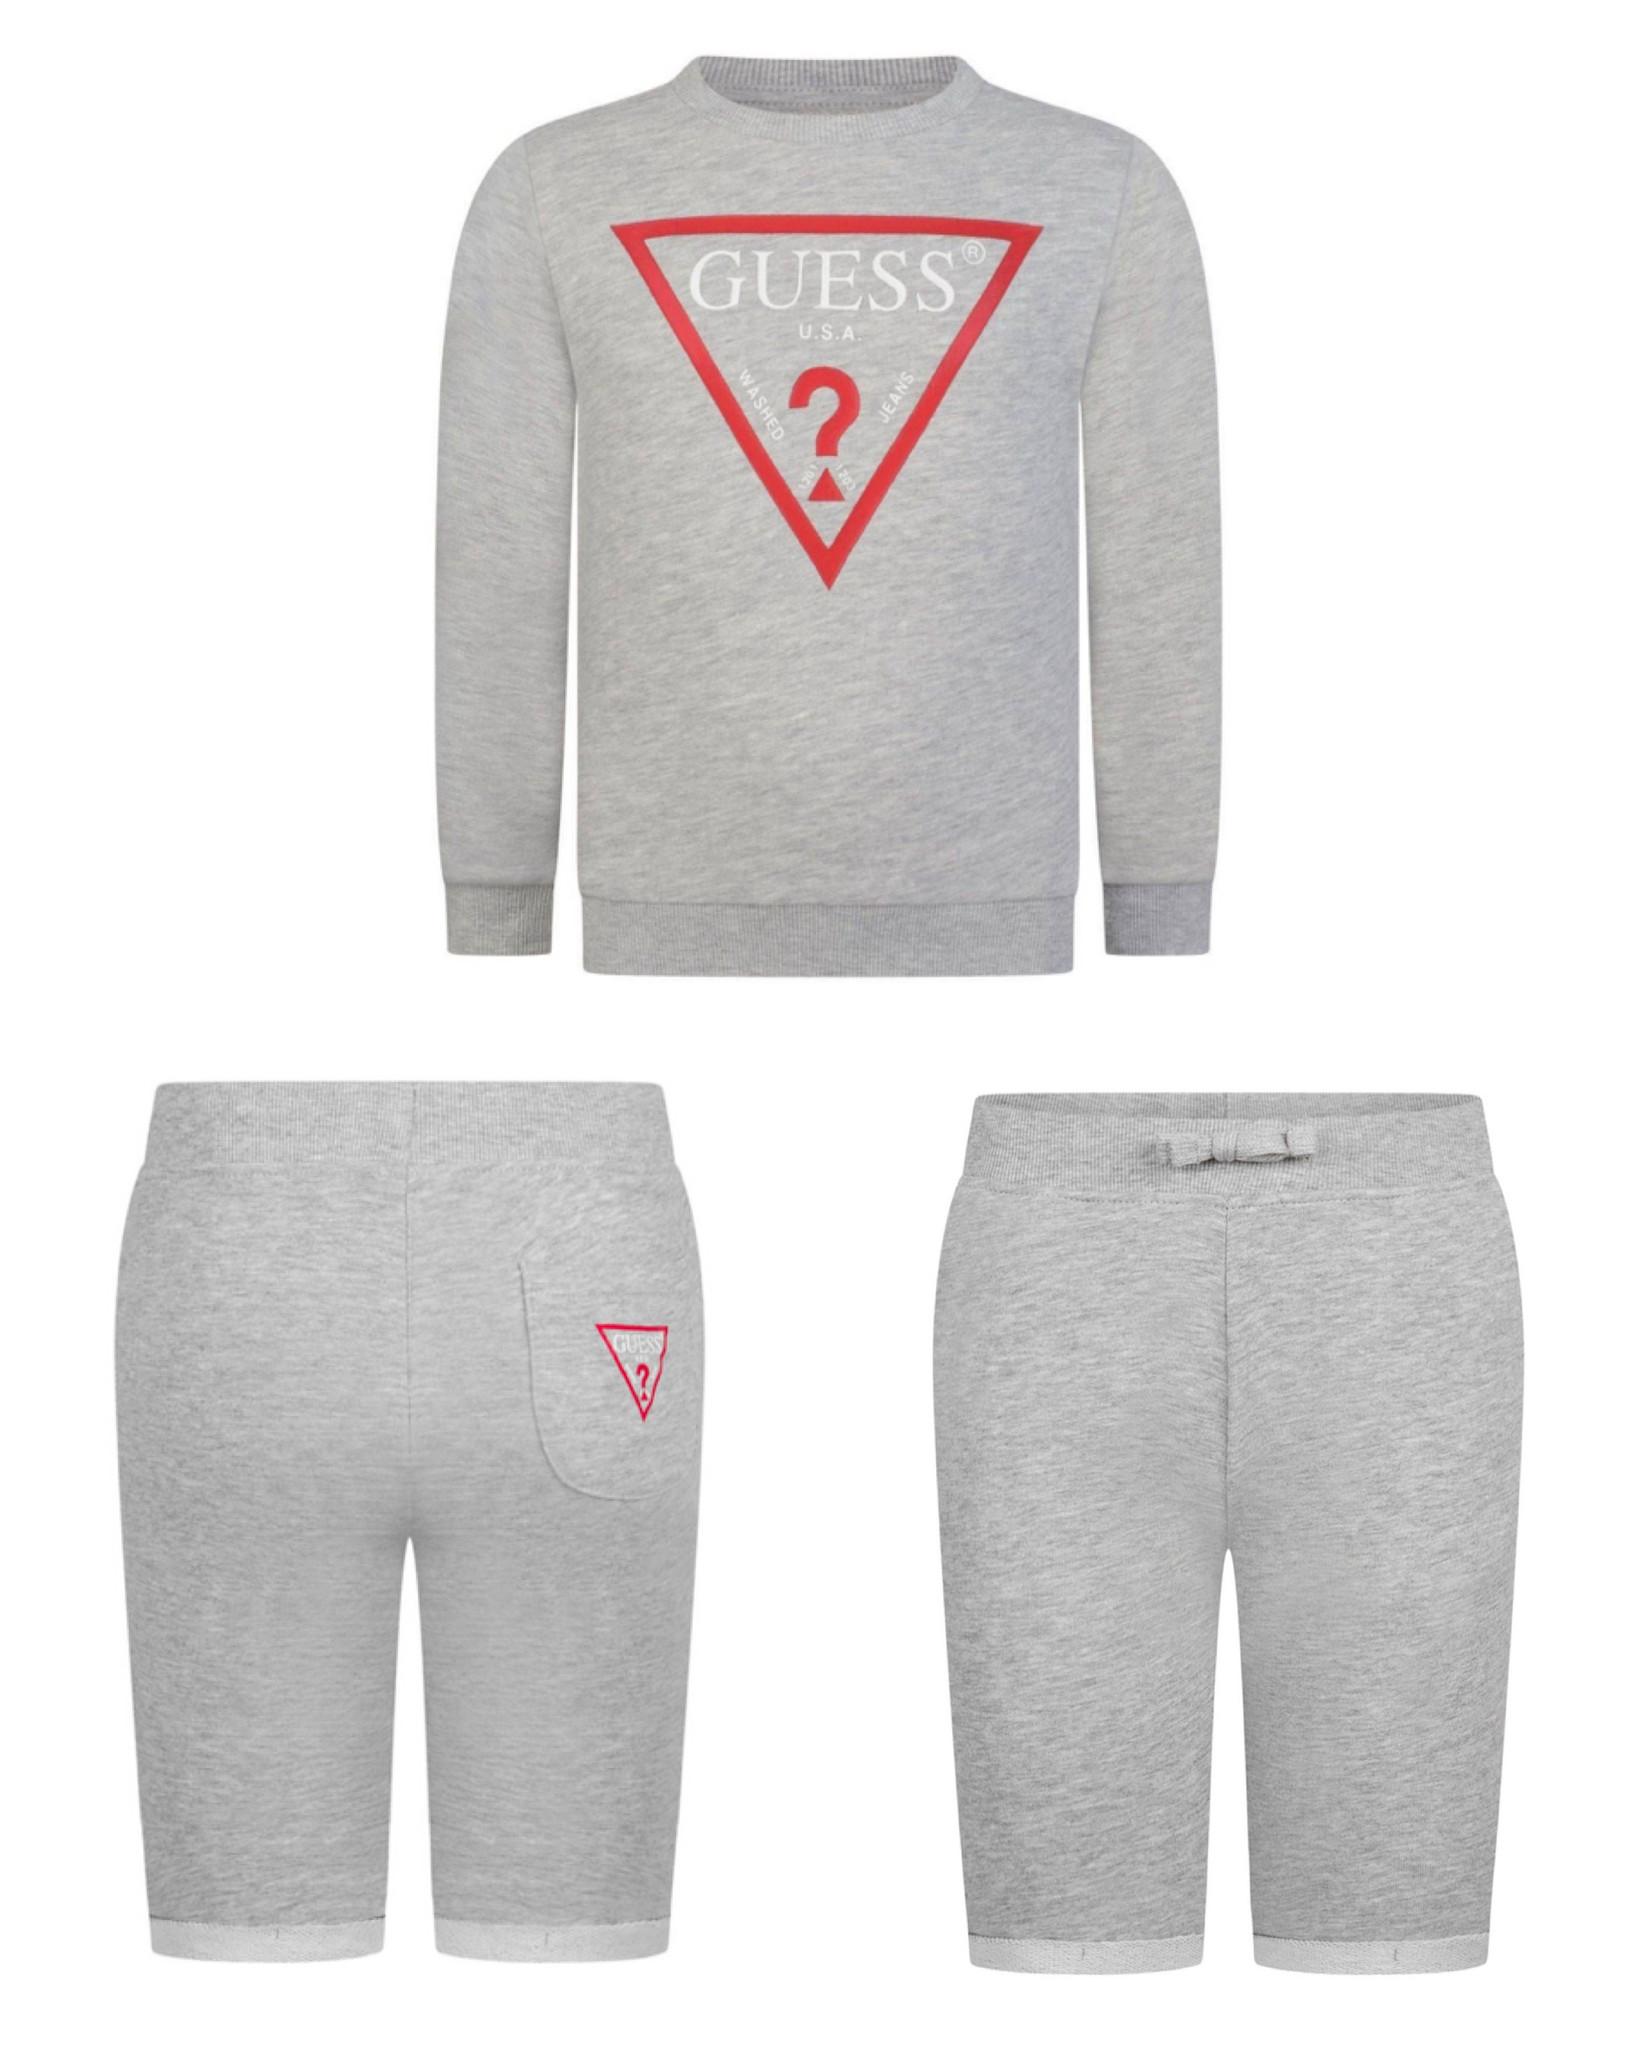 Guess Grey/Red Logo Short Set S21